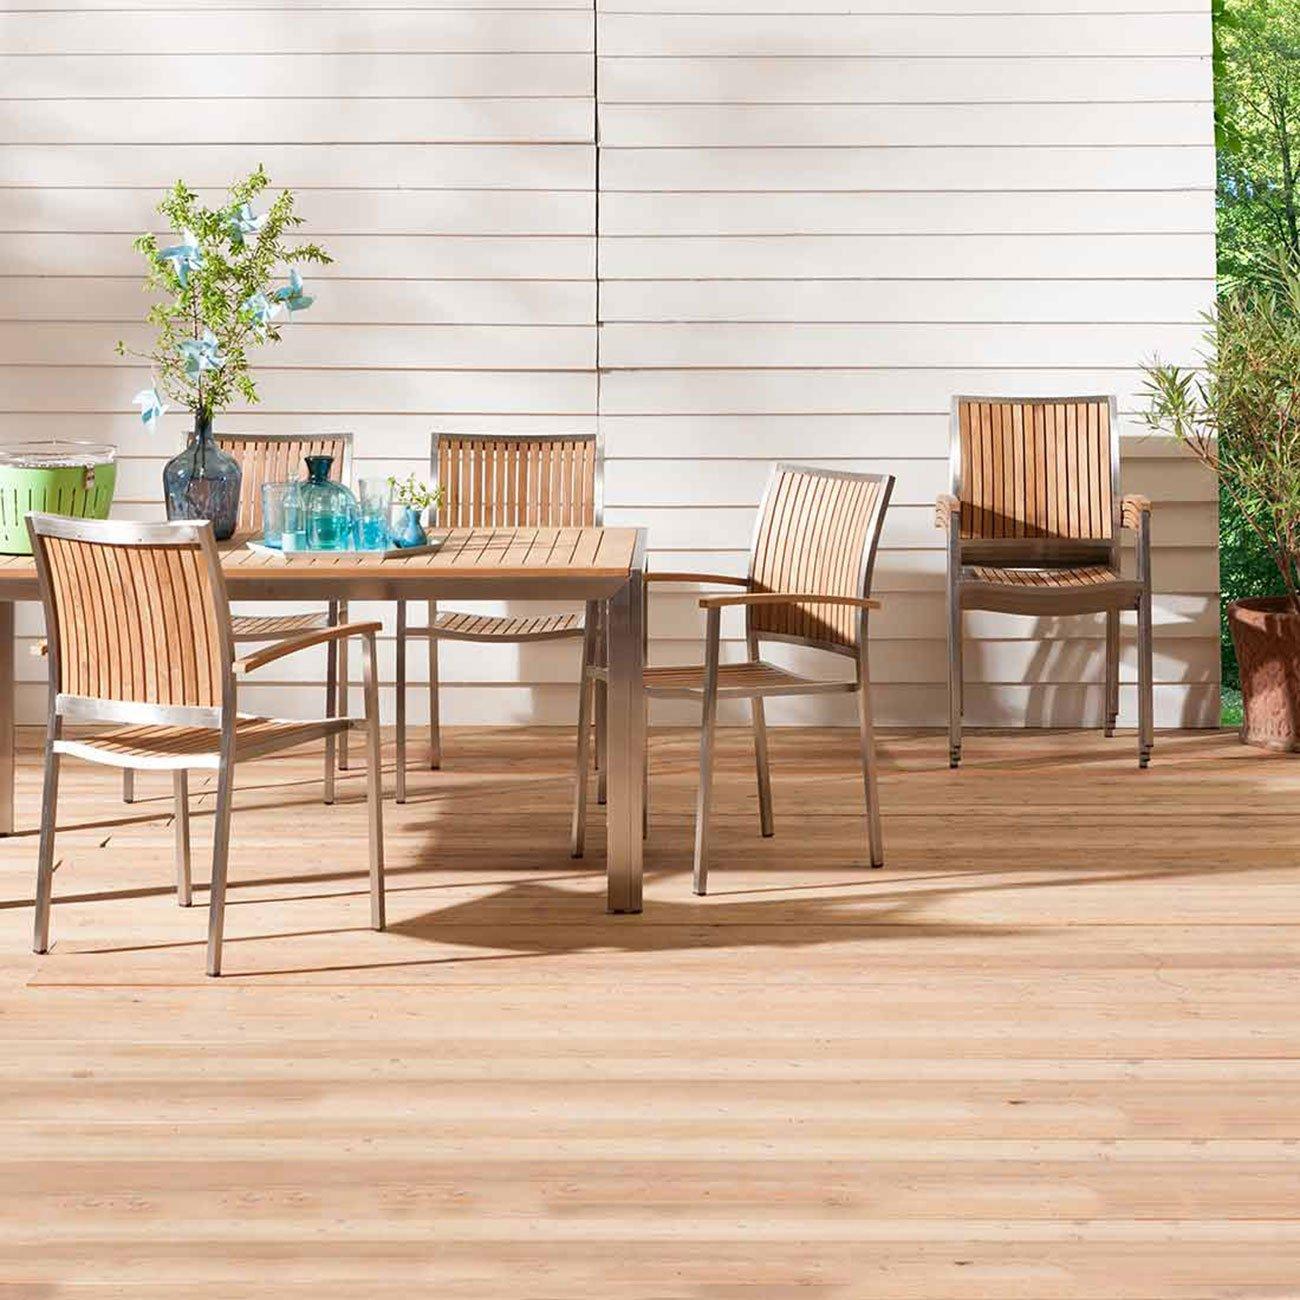 Silla de jardín outliv. Pasadena – Sillón apilable acero inoxidable/teca natural silla de jardín: Amazon.es: Jardín